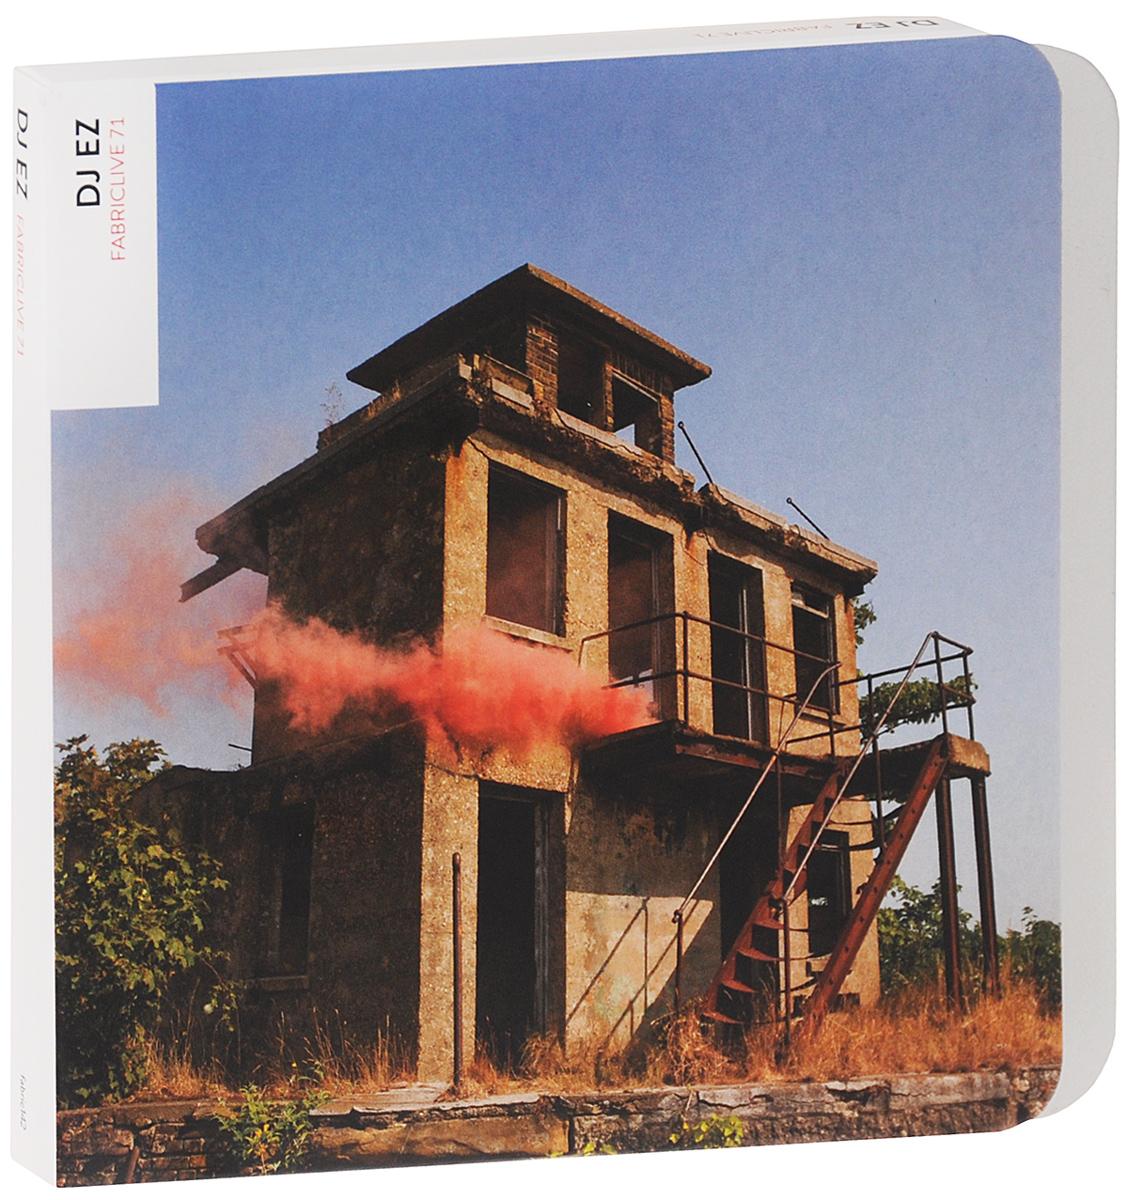 Dj EZ. Fabriclive 71 2013 Audio CD